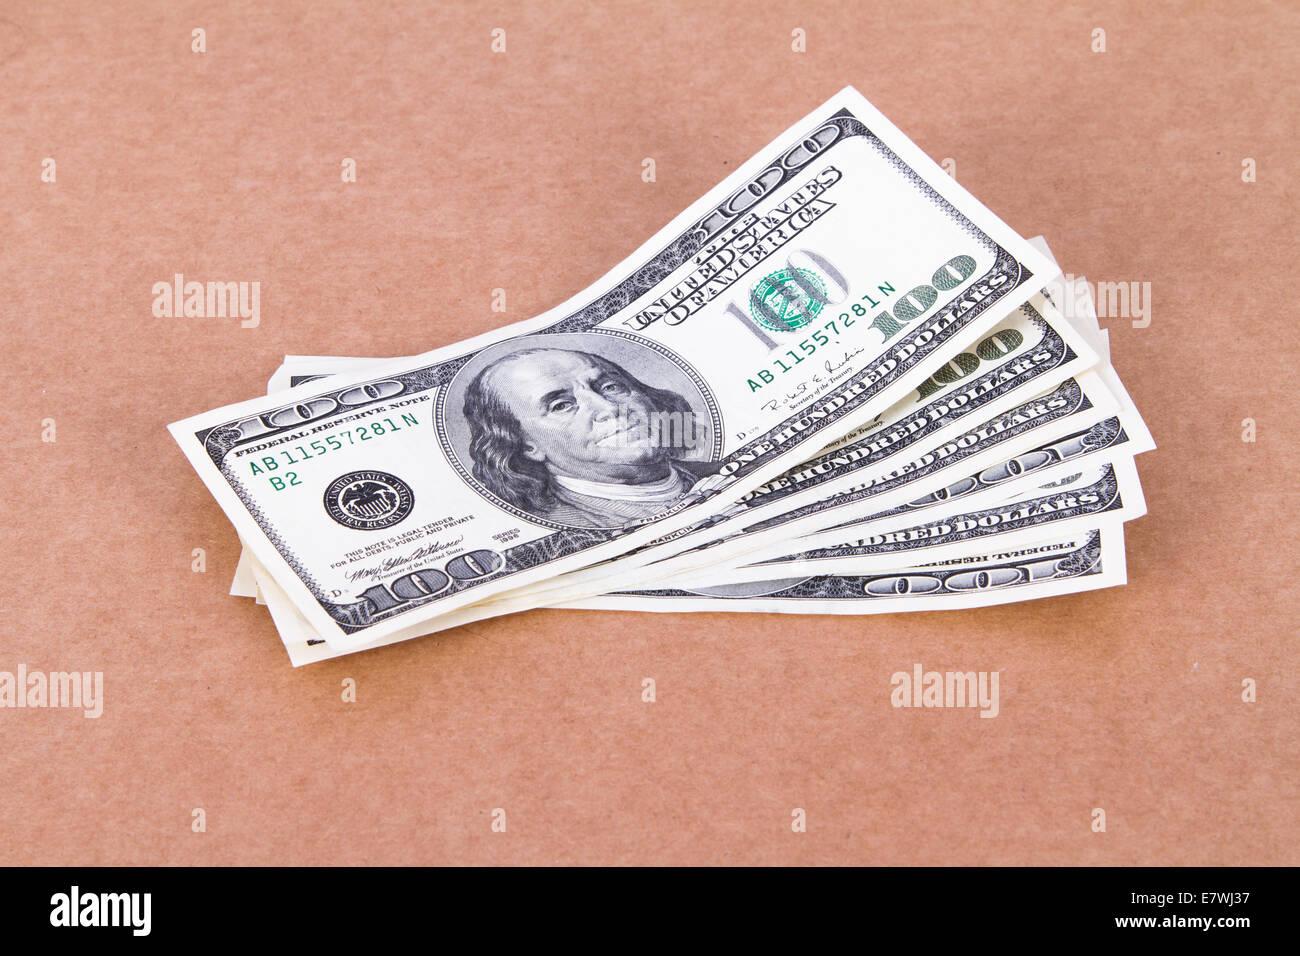 Money concept, one hundred dollar bills on cork board. - Stock Image